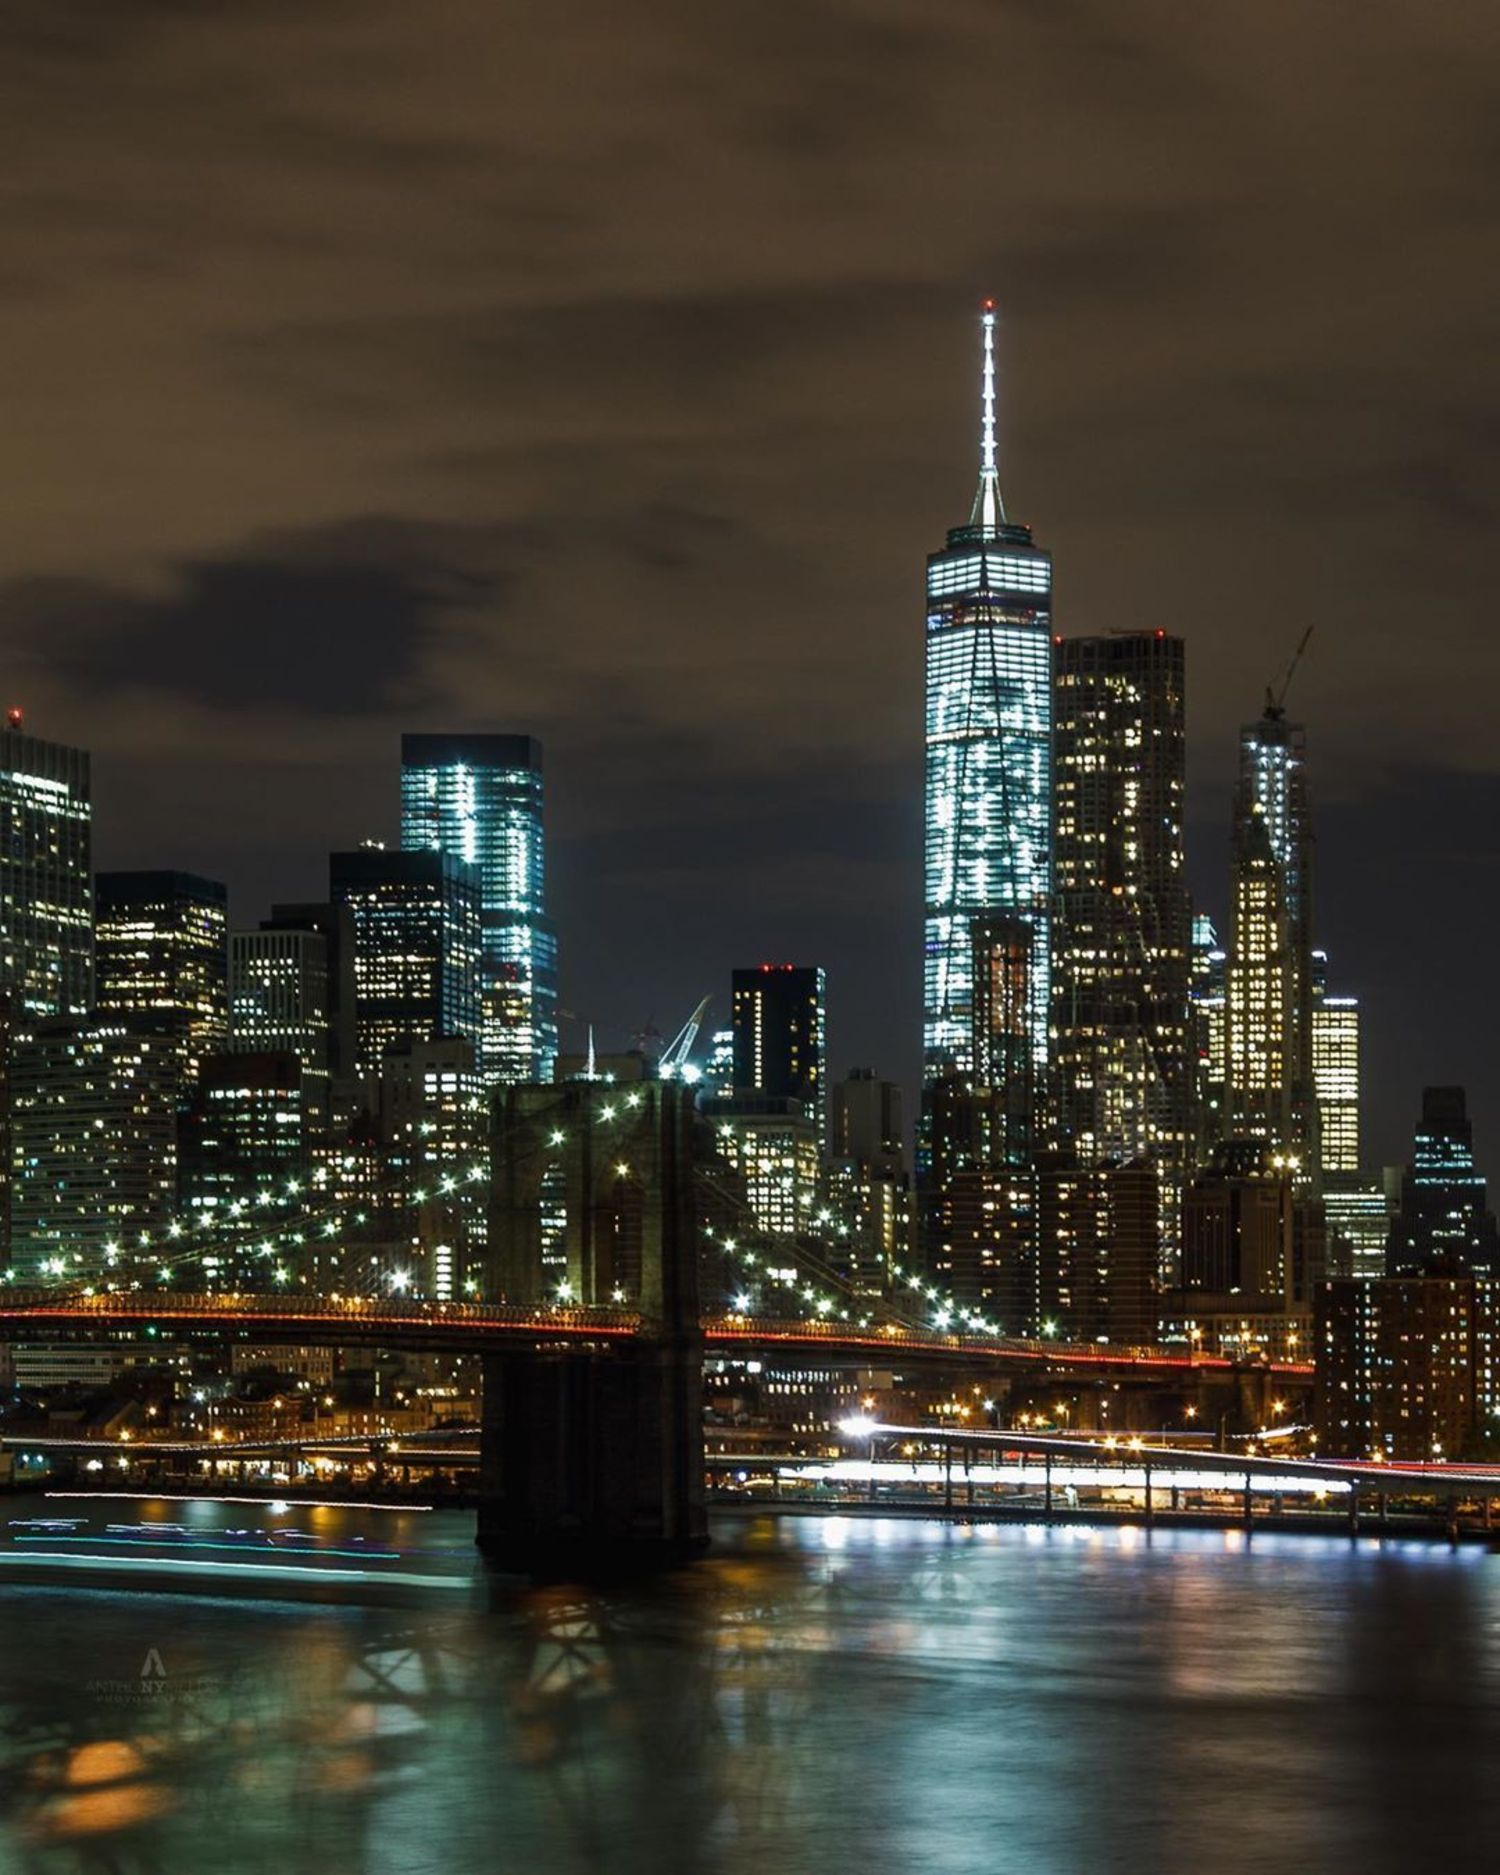 Brooklyn Bridge and Lower Manhattan from BRooklyn Bridge Parkk